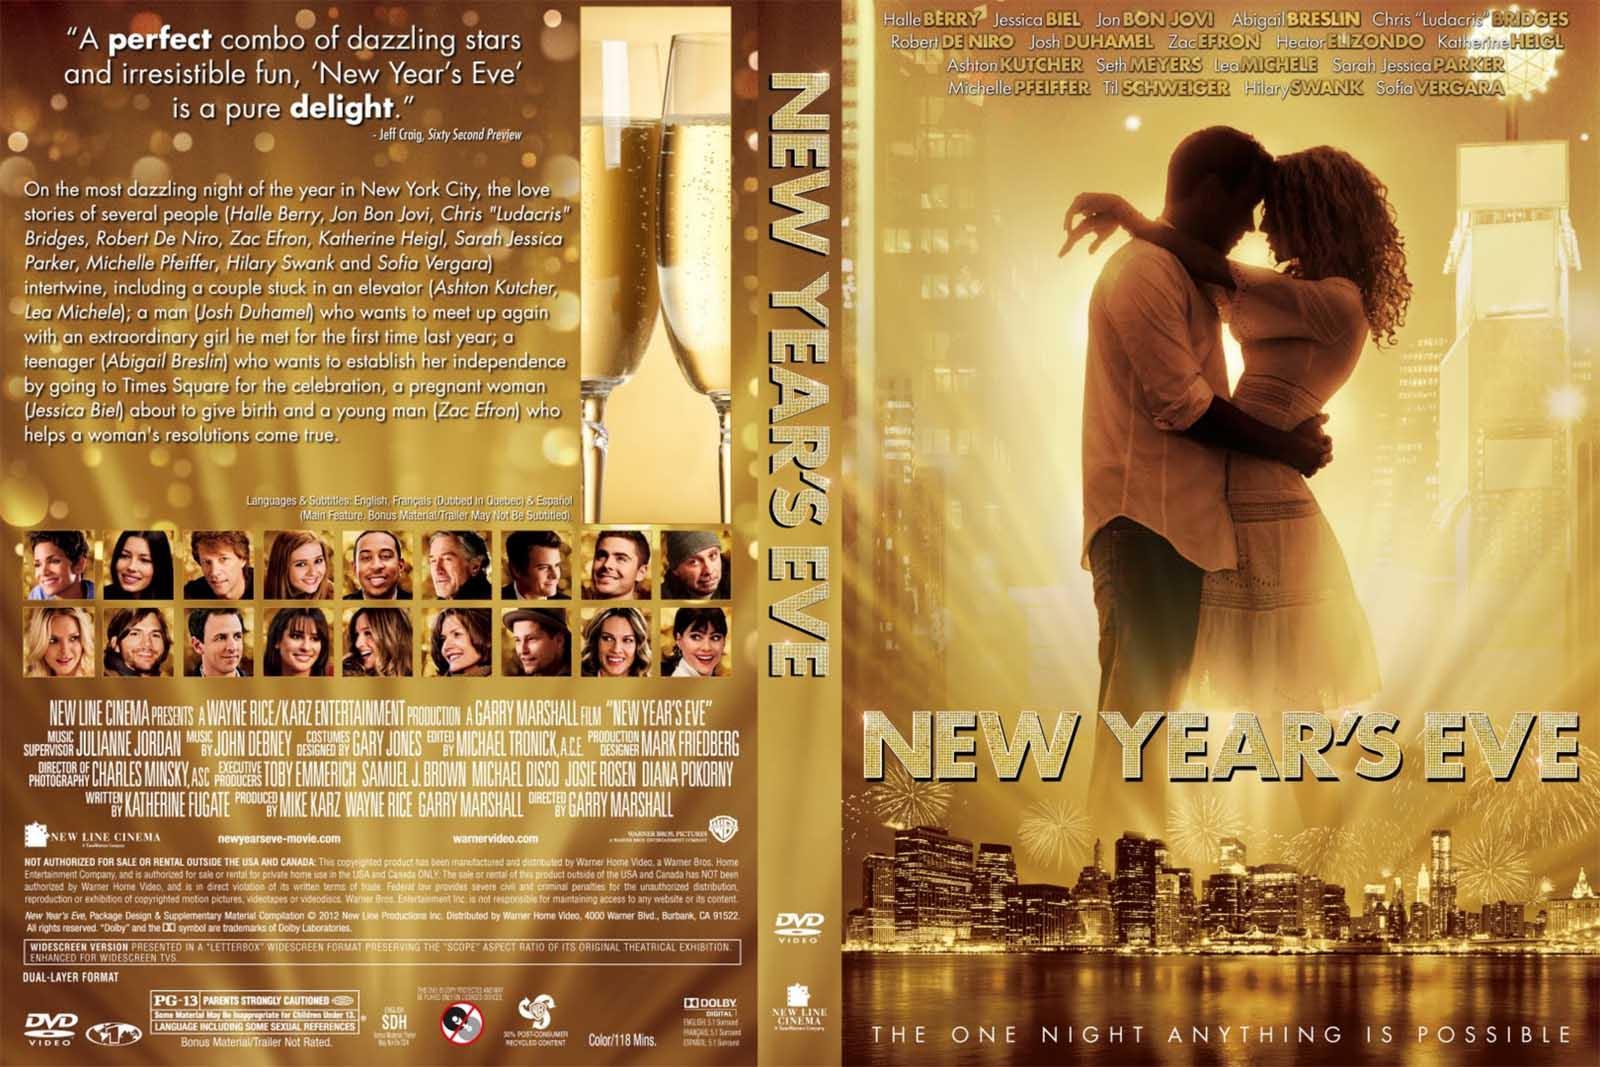 http://3.bp.blogspot.com/-a_zGufJbsUo/TwfGkbTJSeI/AAAAAAAAD_w/tYn7NxeY_ZQ/s1600/New+Years+Eve+%25282%2529.jpg